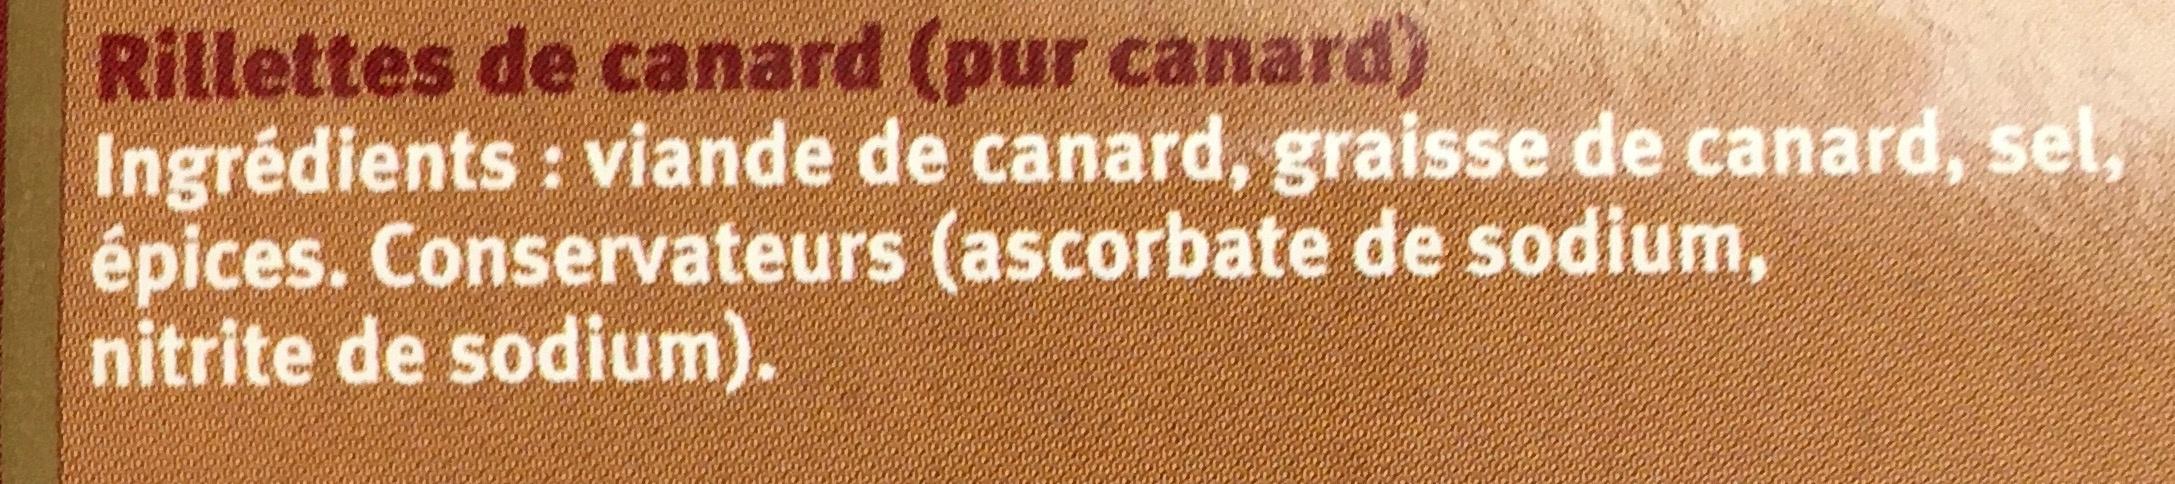 Rillettes de Canard pur Canard - Ingrediënten - fr